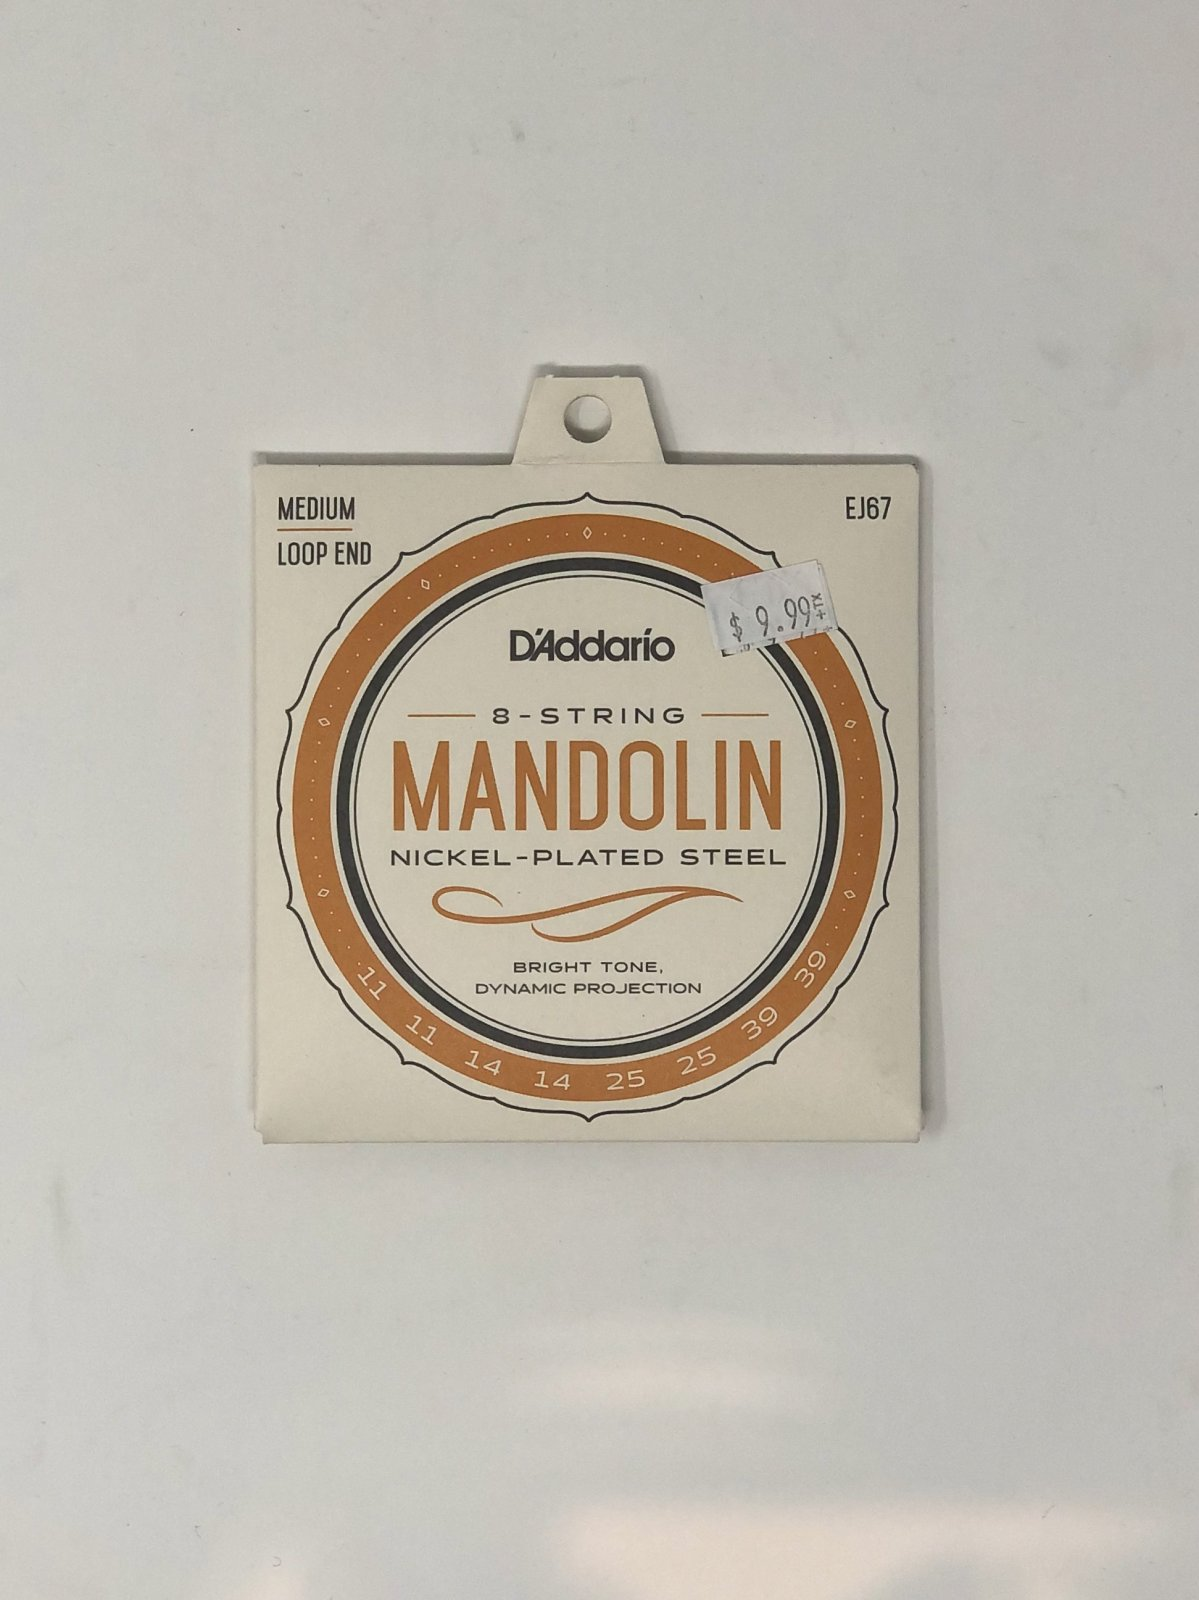 D'Addario EJ67 Mandolin Strings, Nickel-Plated Steel